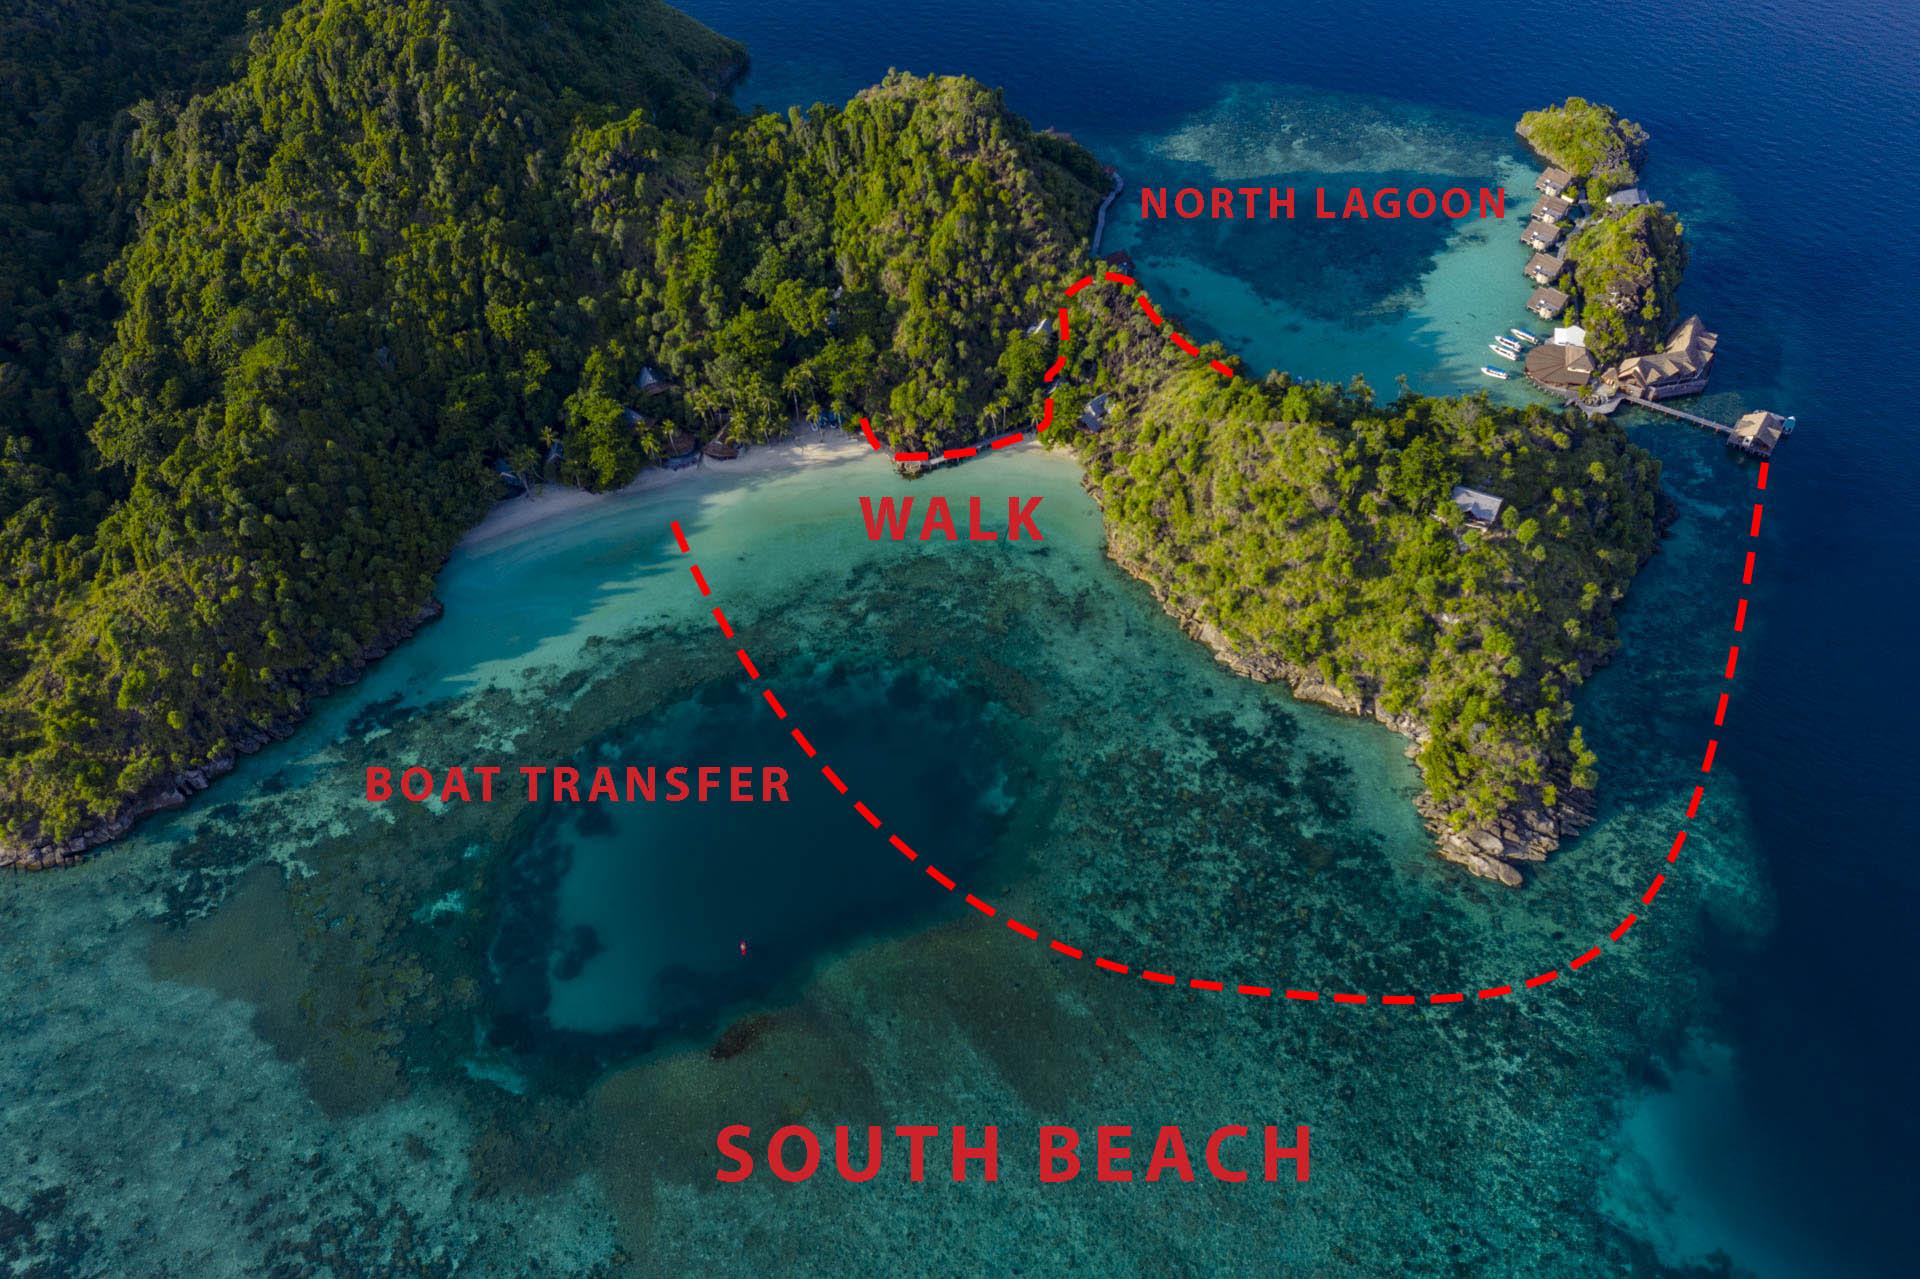 Map of Misool resort's south beach